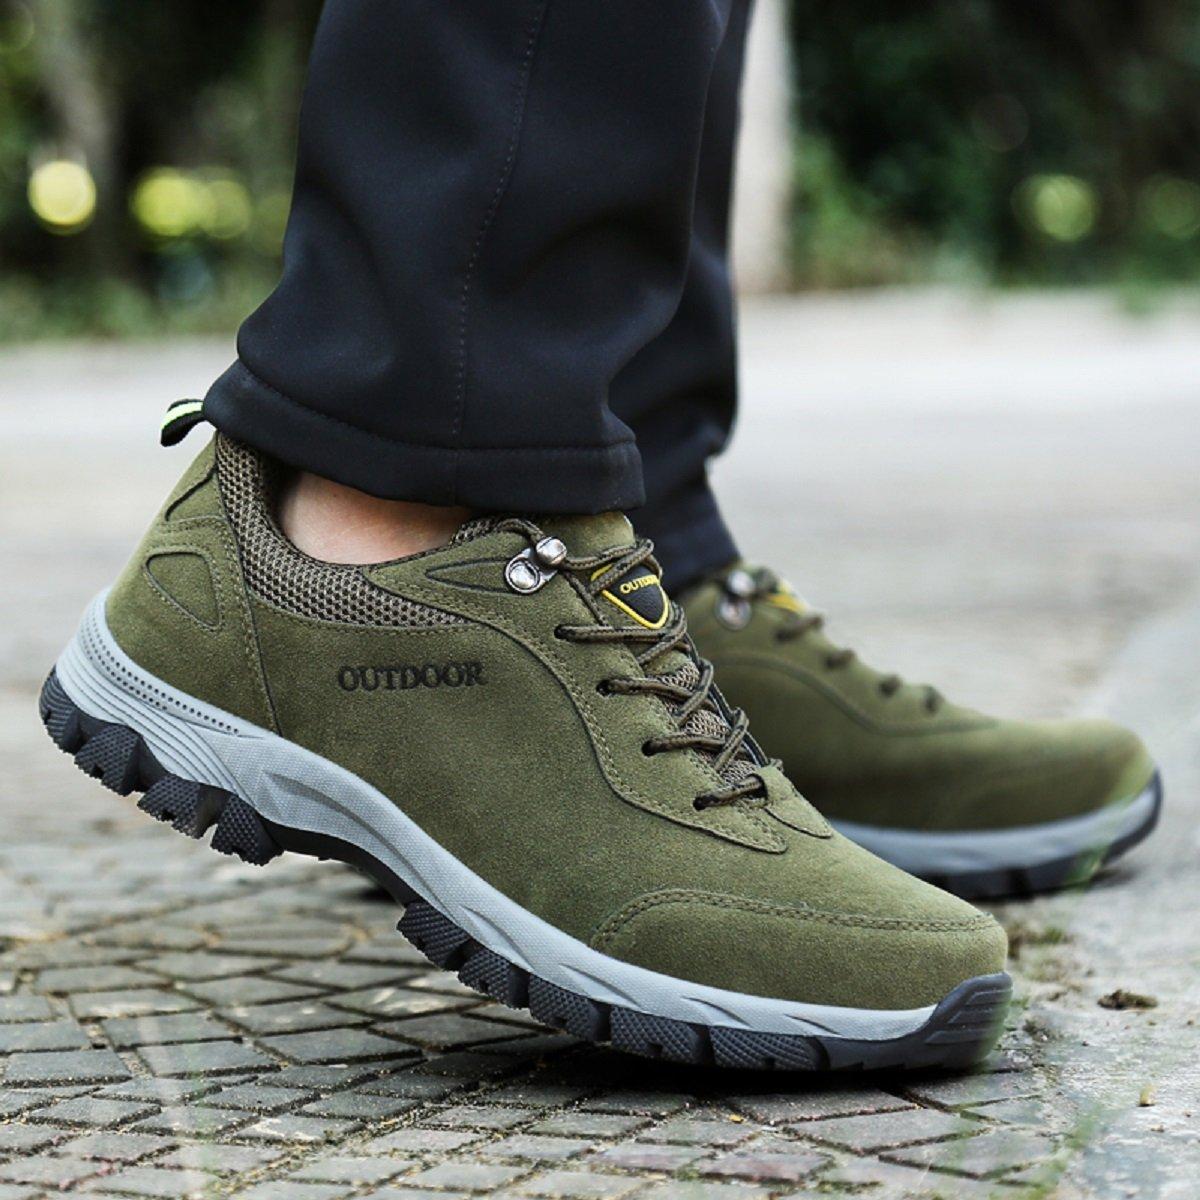 5da27882549ba NEOKER Wanderschuhe Trekking Schuhe Herren Damen Sports Outdoor Hiking  Sneaker Armee Grün Blau Schwarz Grau ...